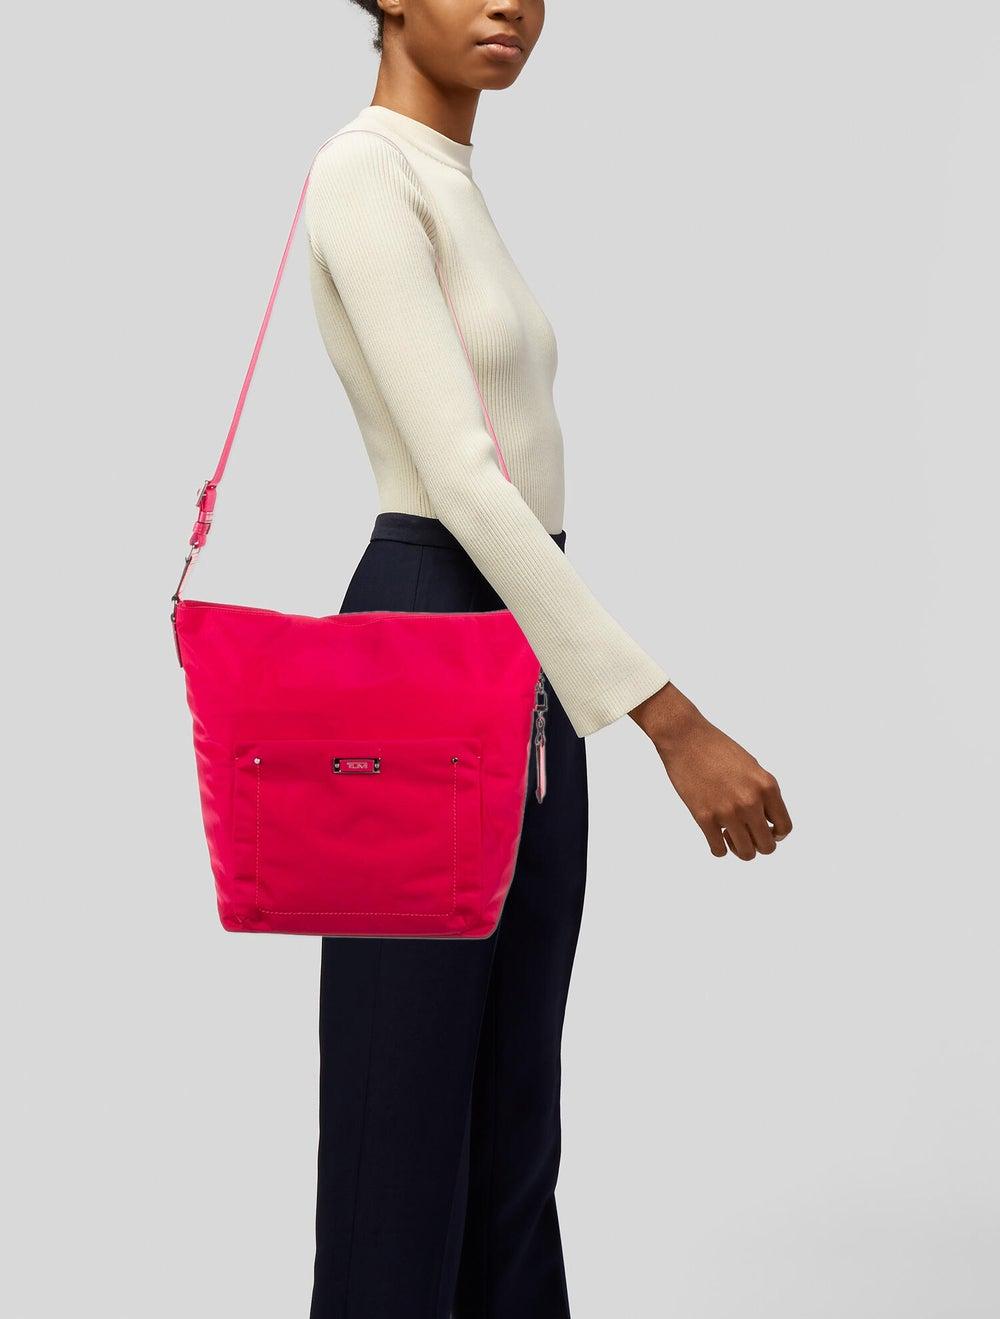 Tumi Nylon Shoulder Bag Pink - image 2